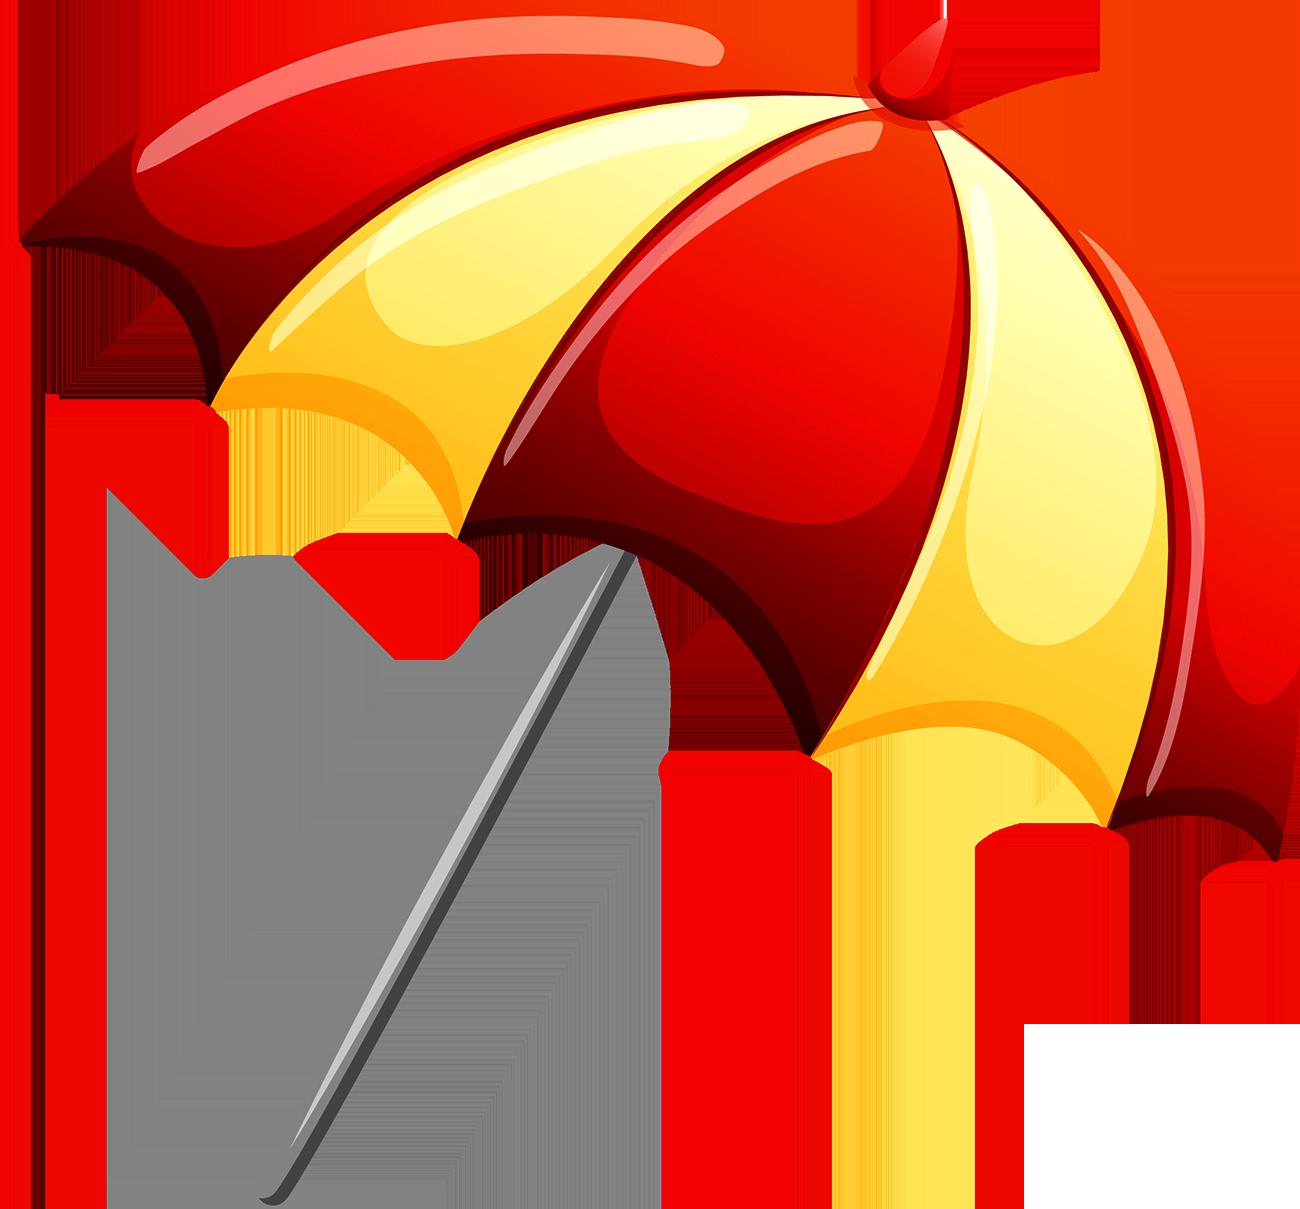 Download Clip Umbrellas Personal - Red And Yellow Umbrella ...